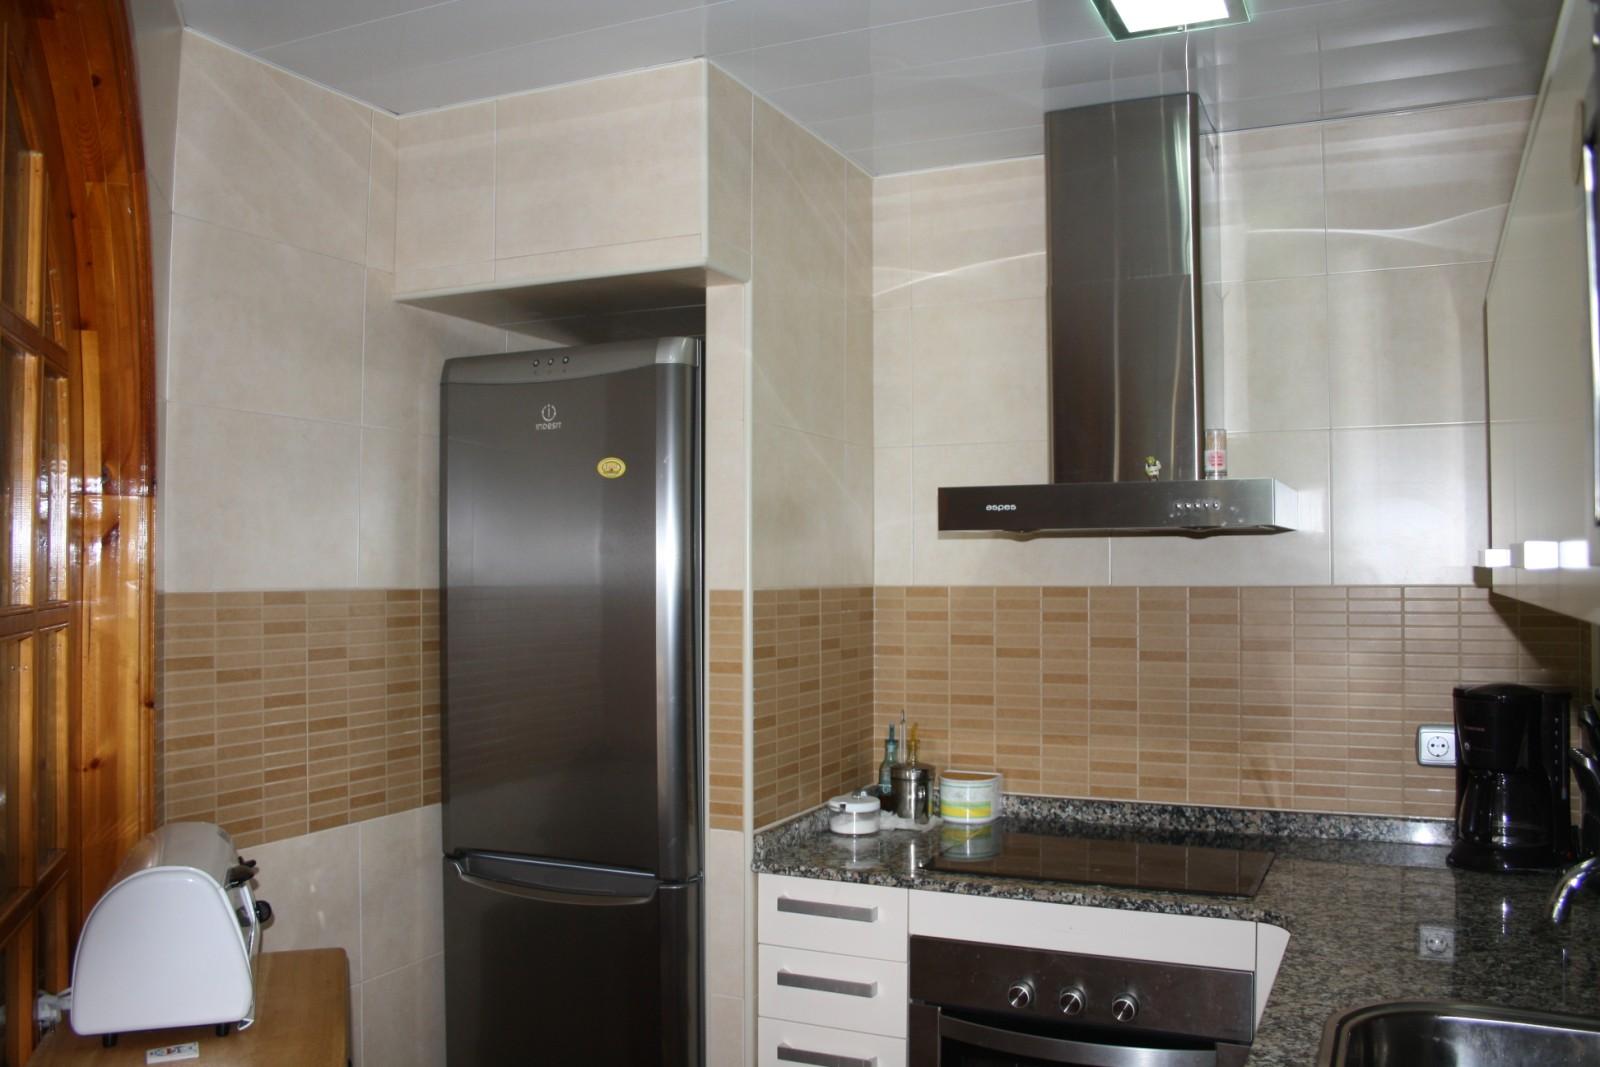 Casa de roda de bara alicatado cocina 4 fotos tarragona alba iler a alicatados y soler as - Alicatado cocina ...